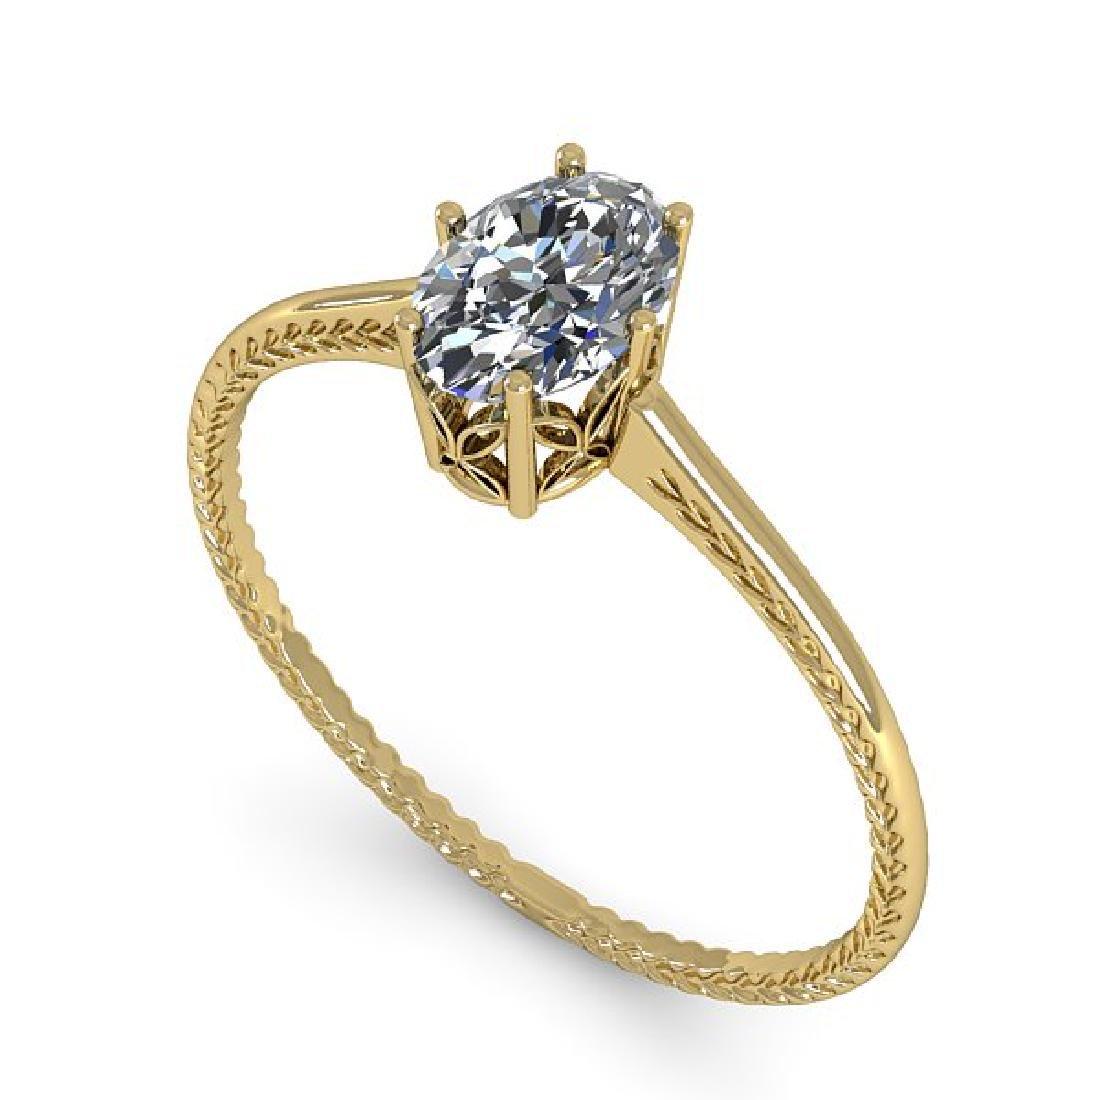 1.0 CTW VS/SI Oval Cut Diamond Art Deco Ring 14K Yellow - 2